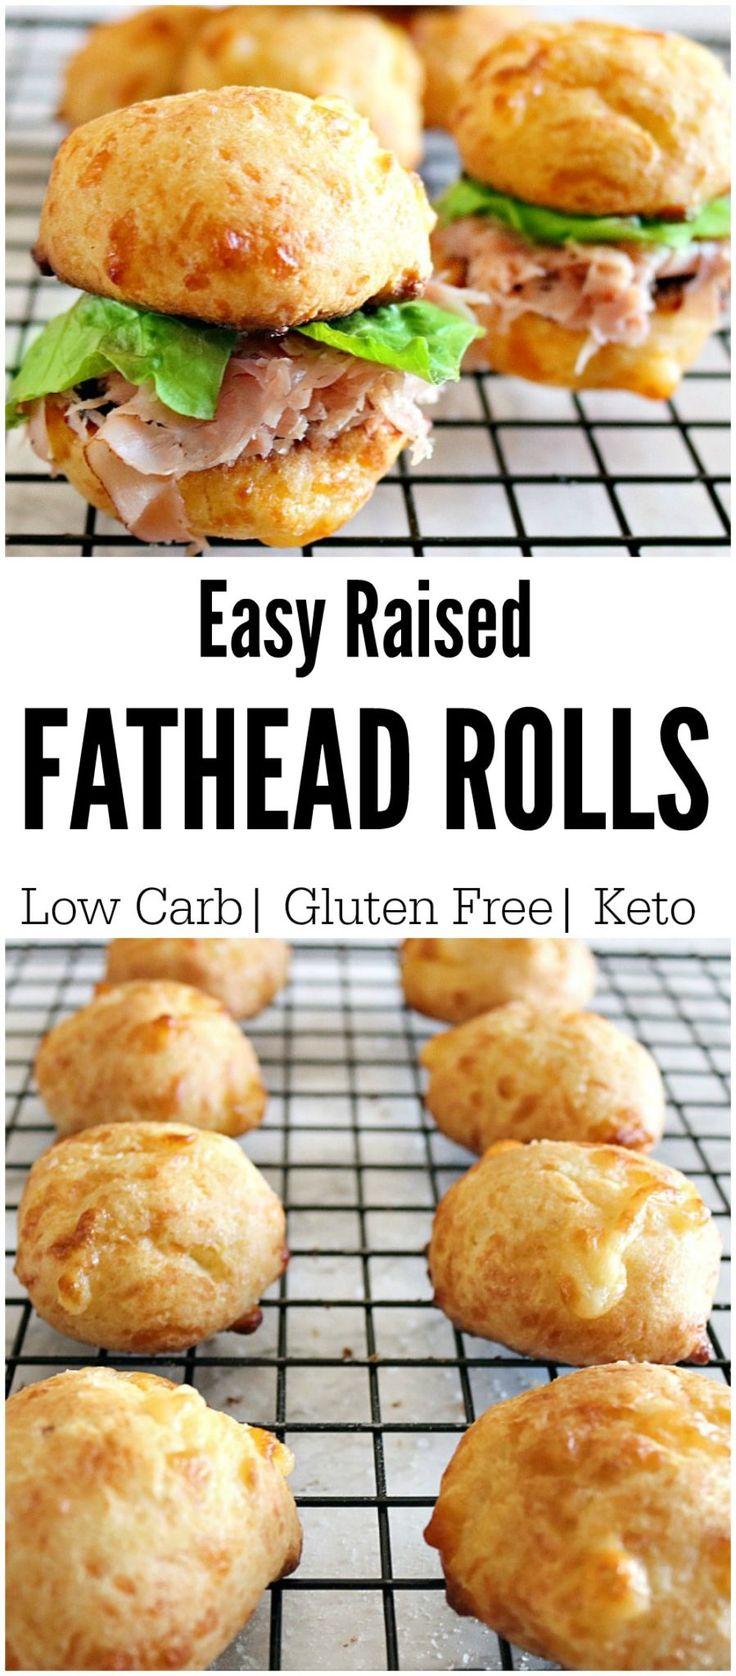 keto fathead rolls